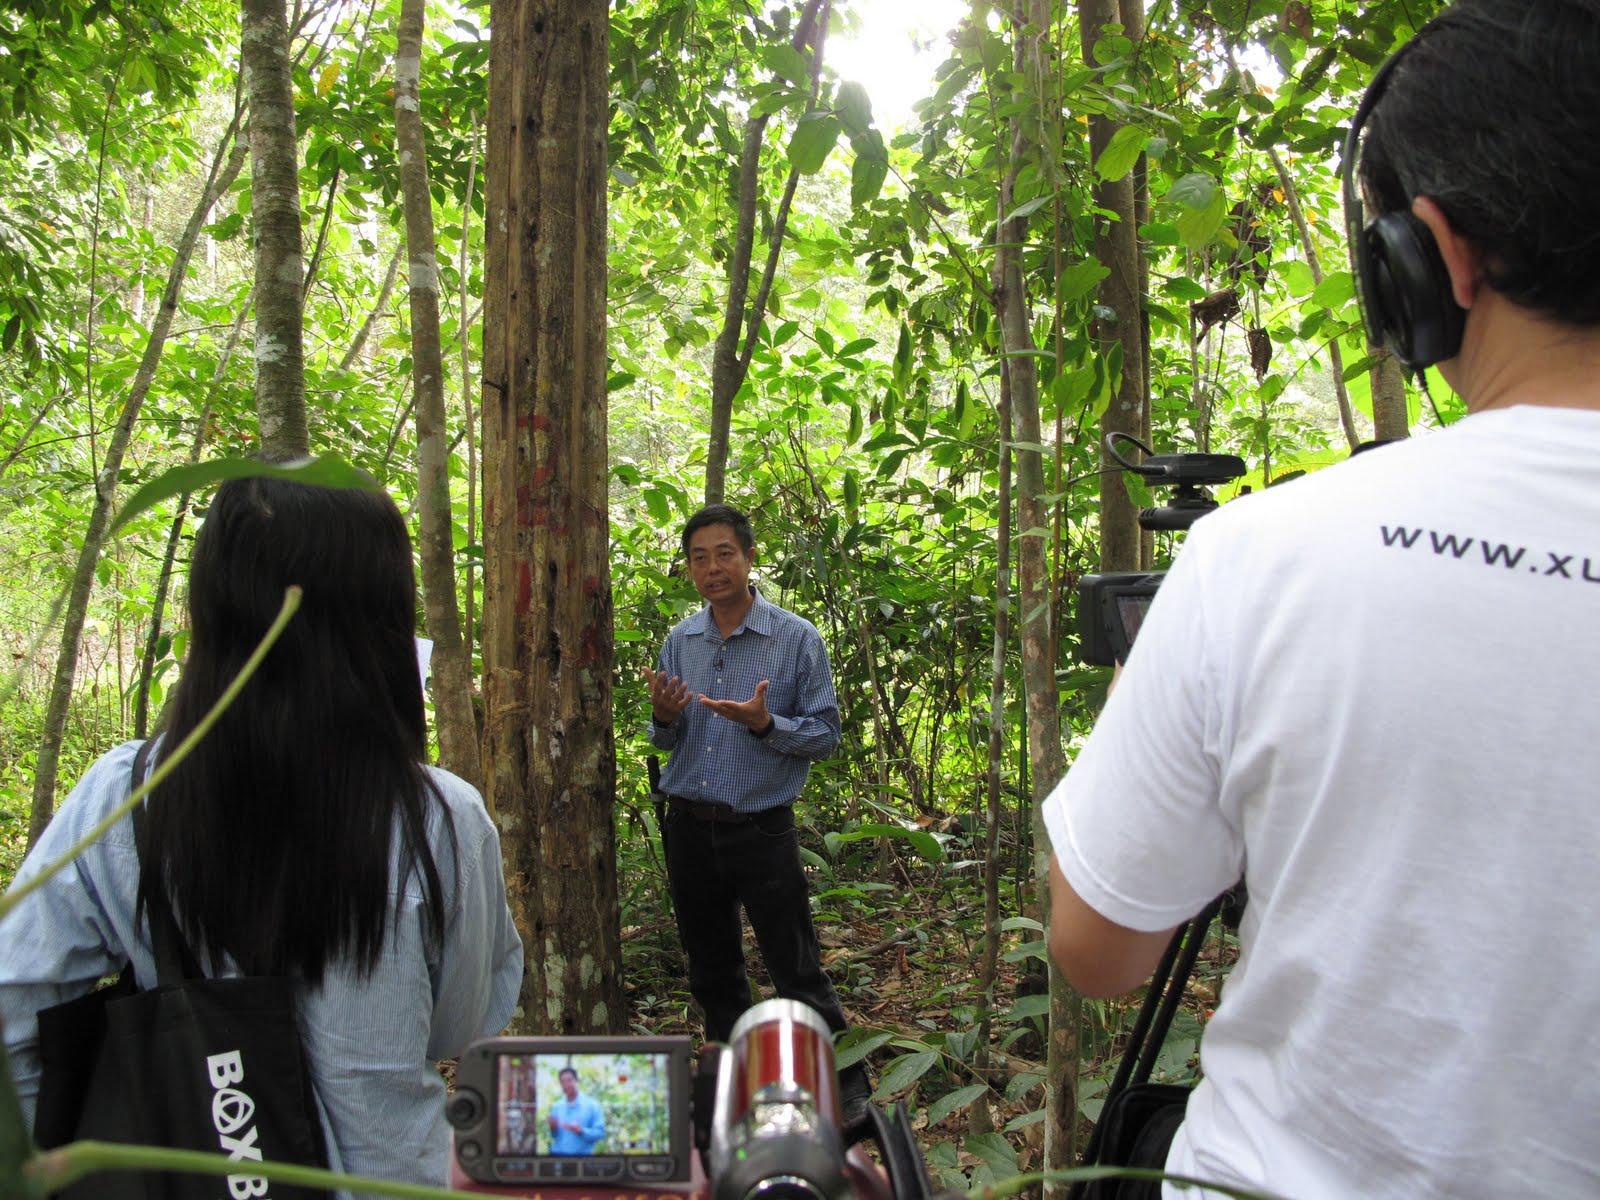 Agarwood Asia 60 Years Old Agarwood Tree Picture 沉香老树